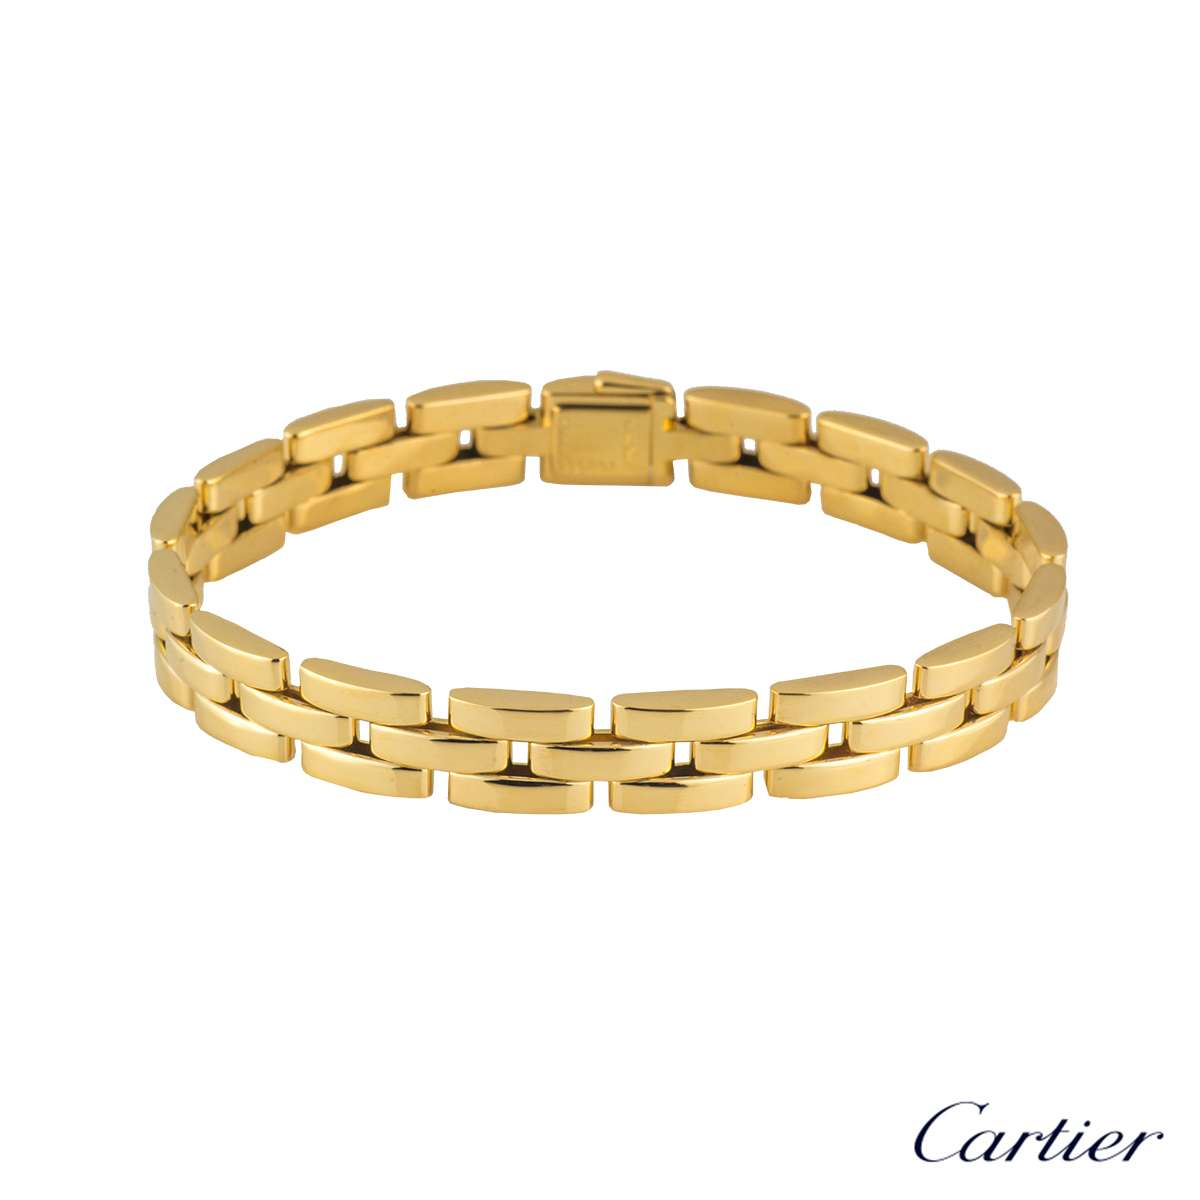 Cartier Infinity Bracelet: Cartier 18k Yellow Gold Maillon Panthere Bracelet B6030900